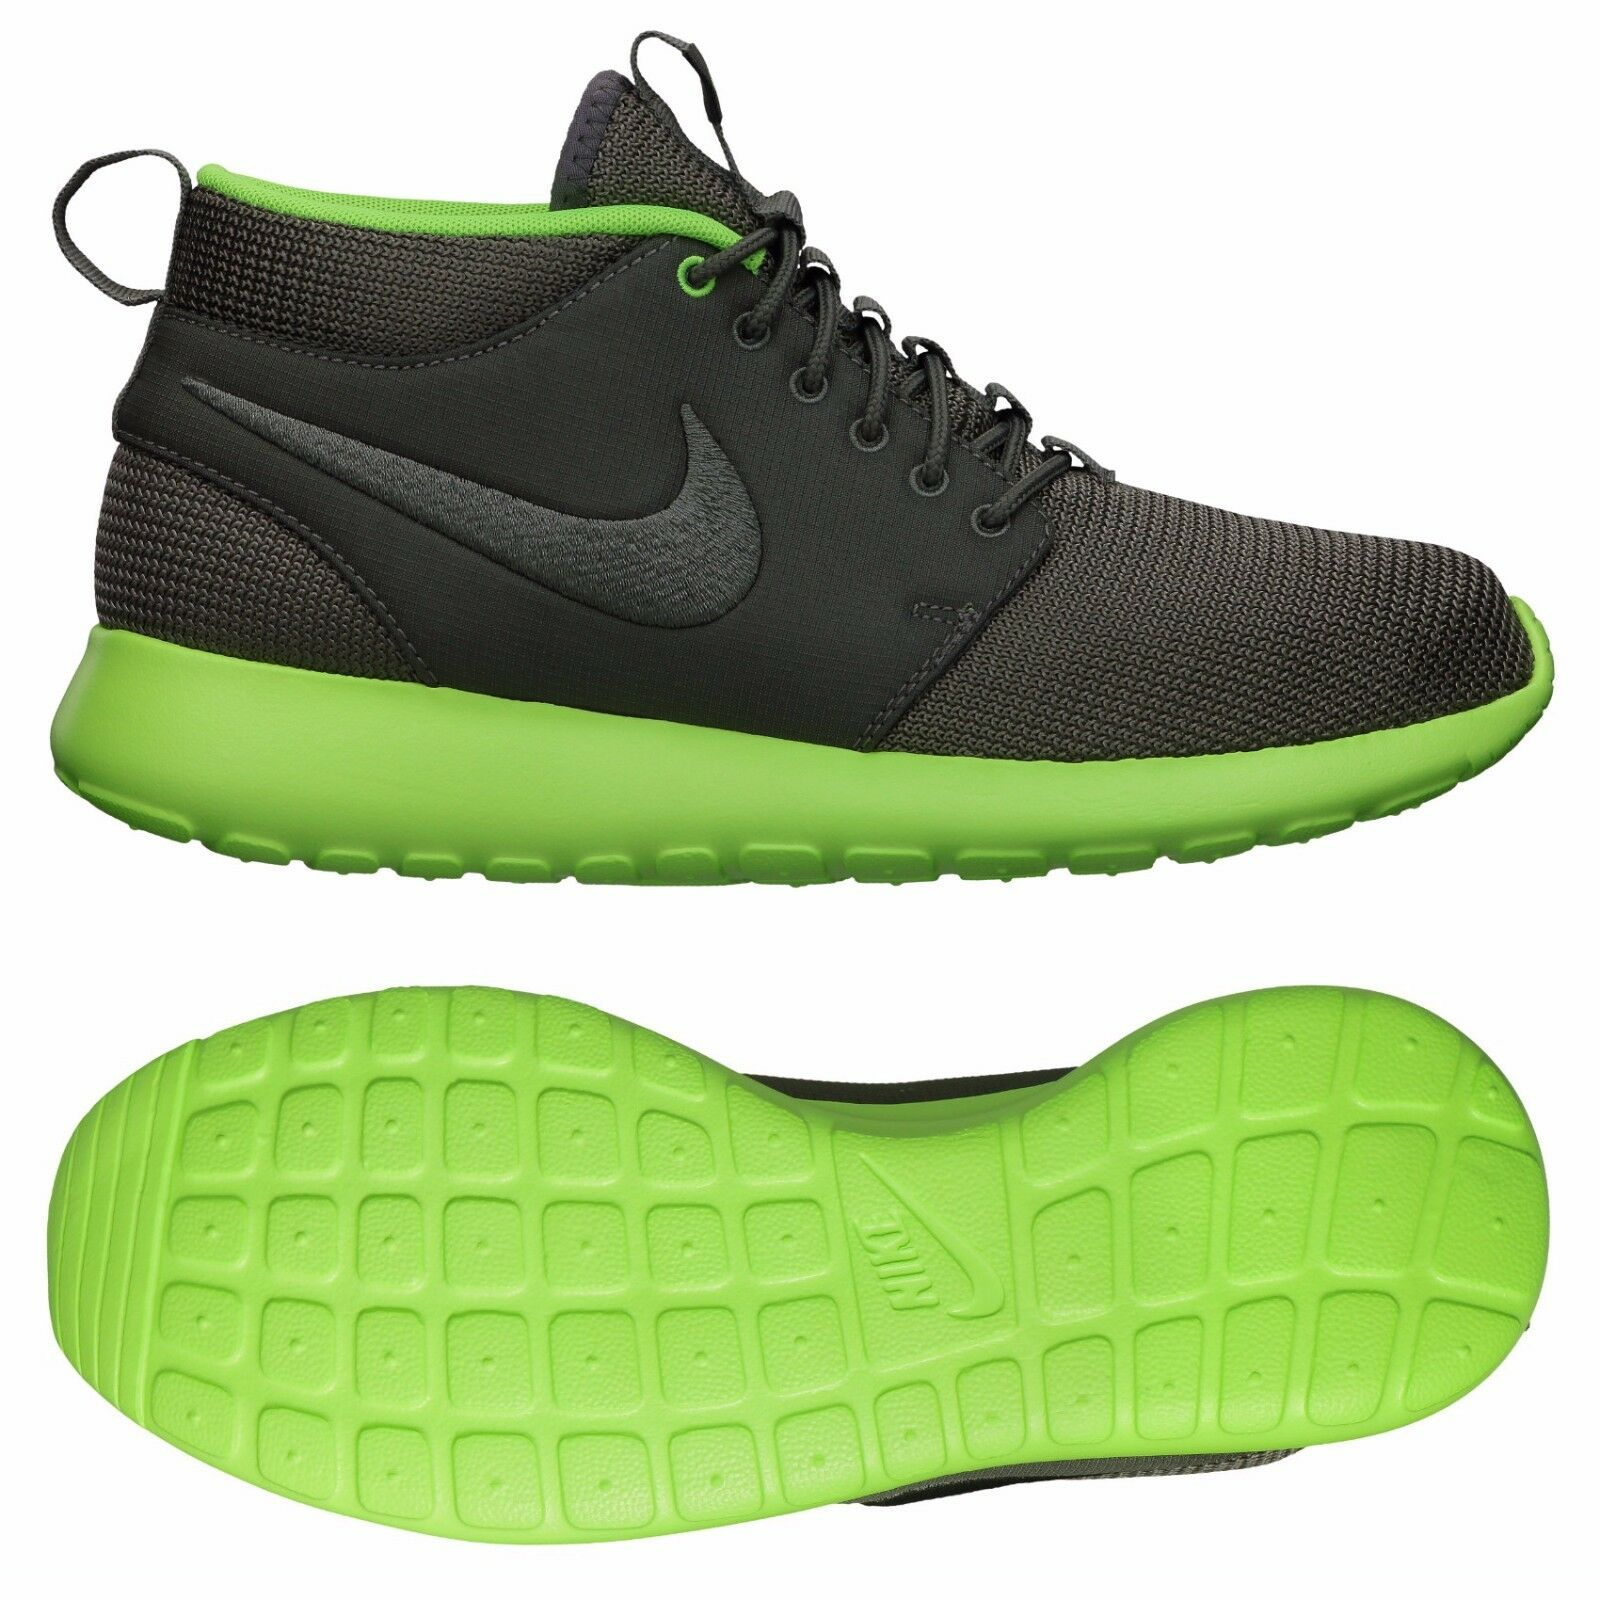 Nike Roshe Run Mid 599501-003 Mercury Grey/Flash Lime/Phylon Zen Men's Shoes